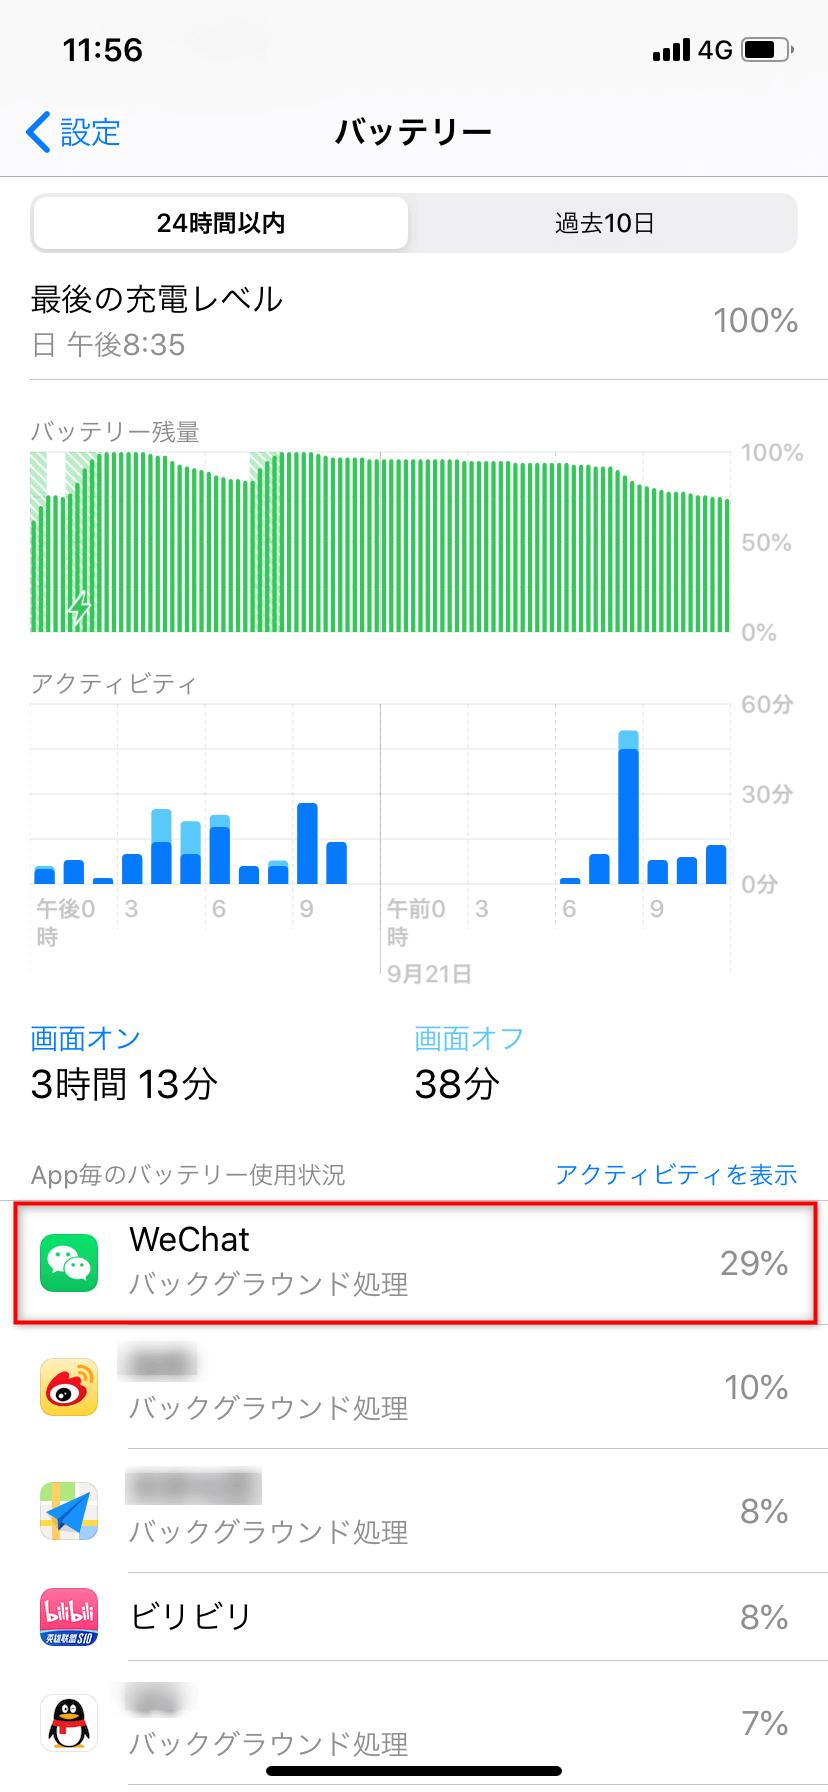 iOS 15バッテリー消費異常の対策 - バッテリーの使用率が高いアプリの利用を抑える